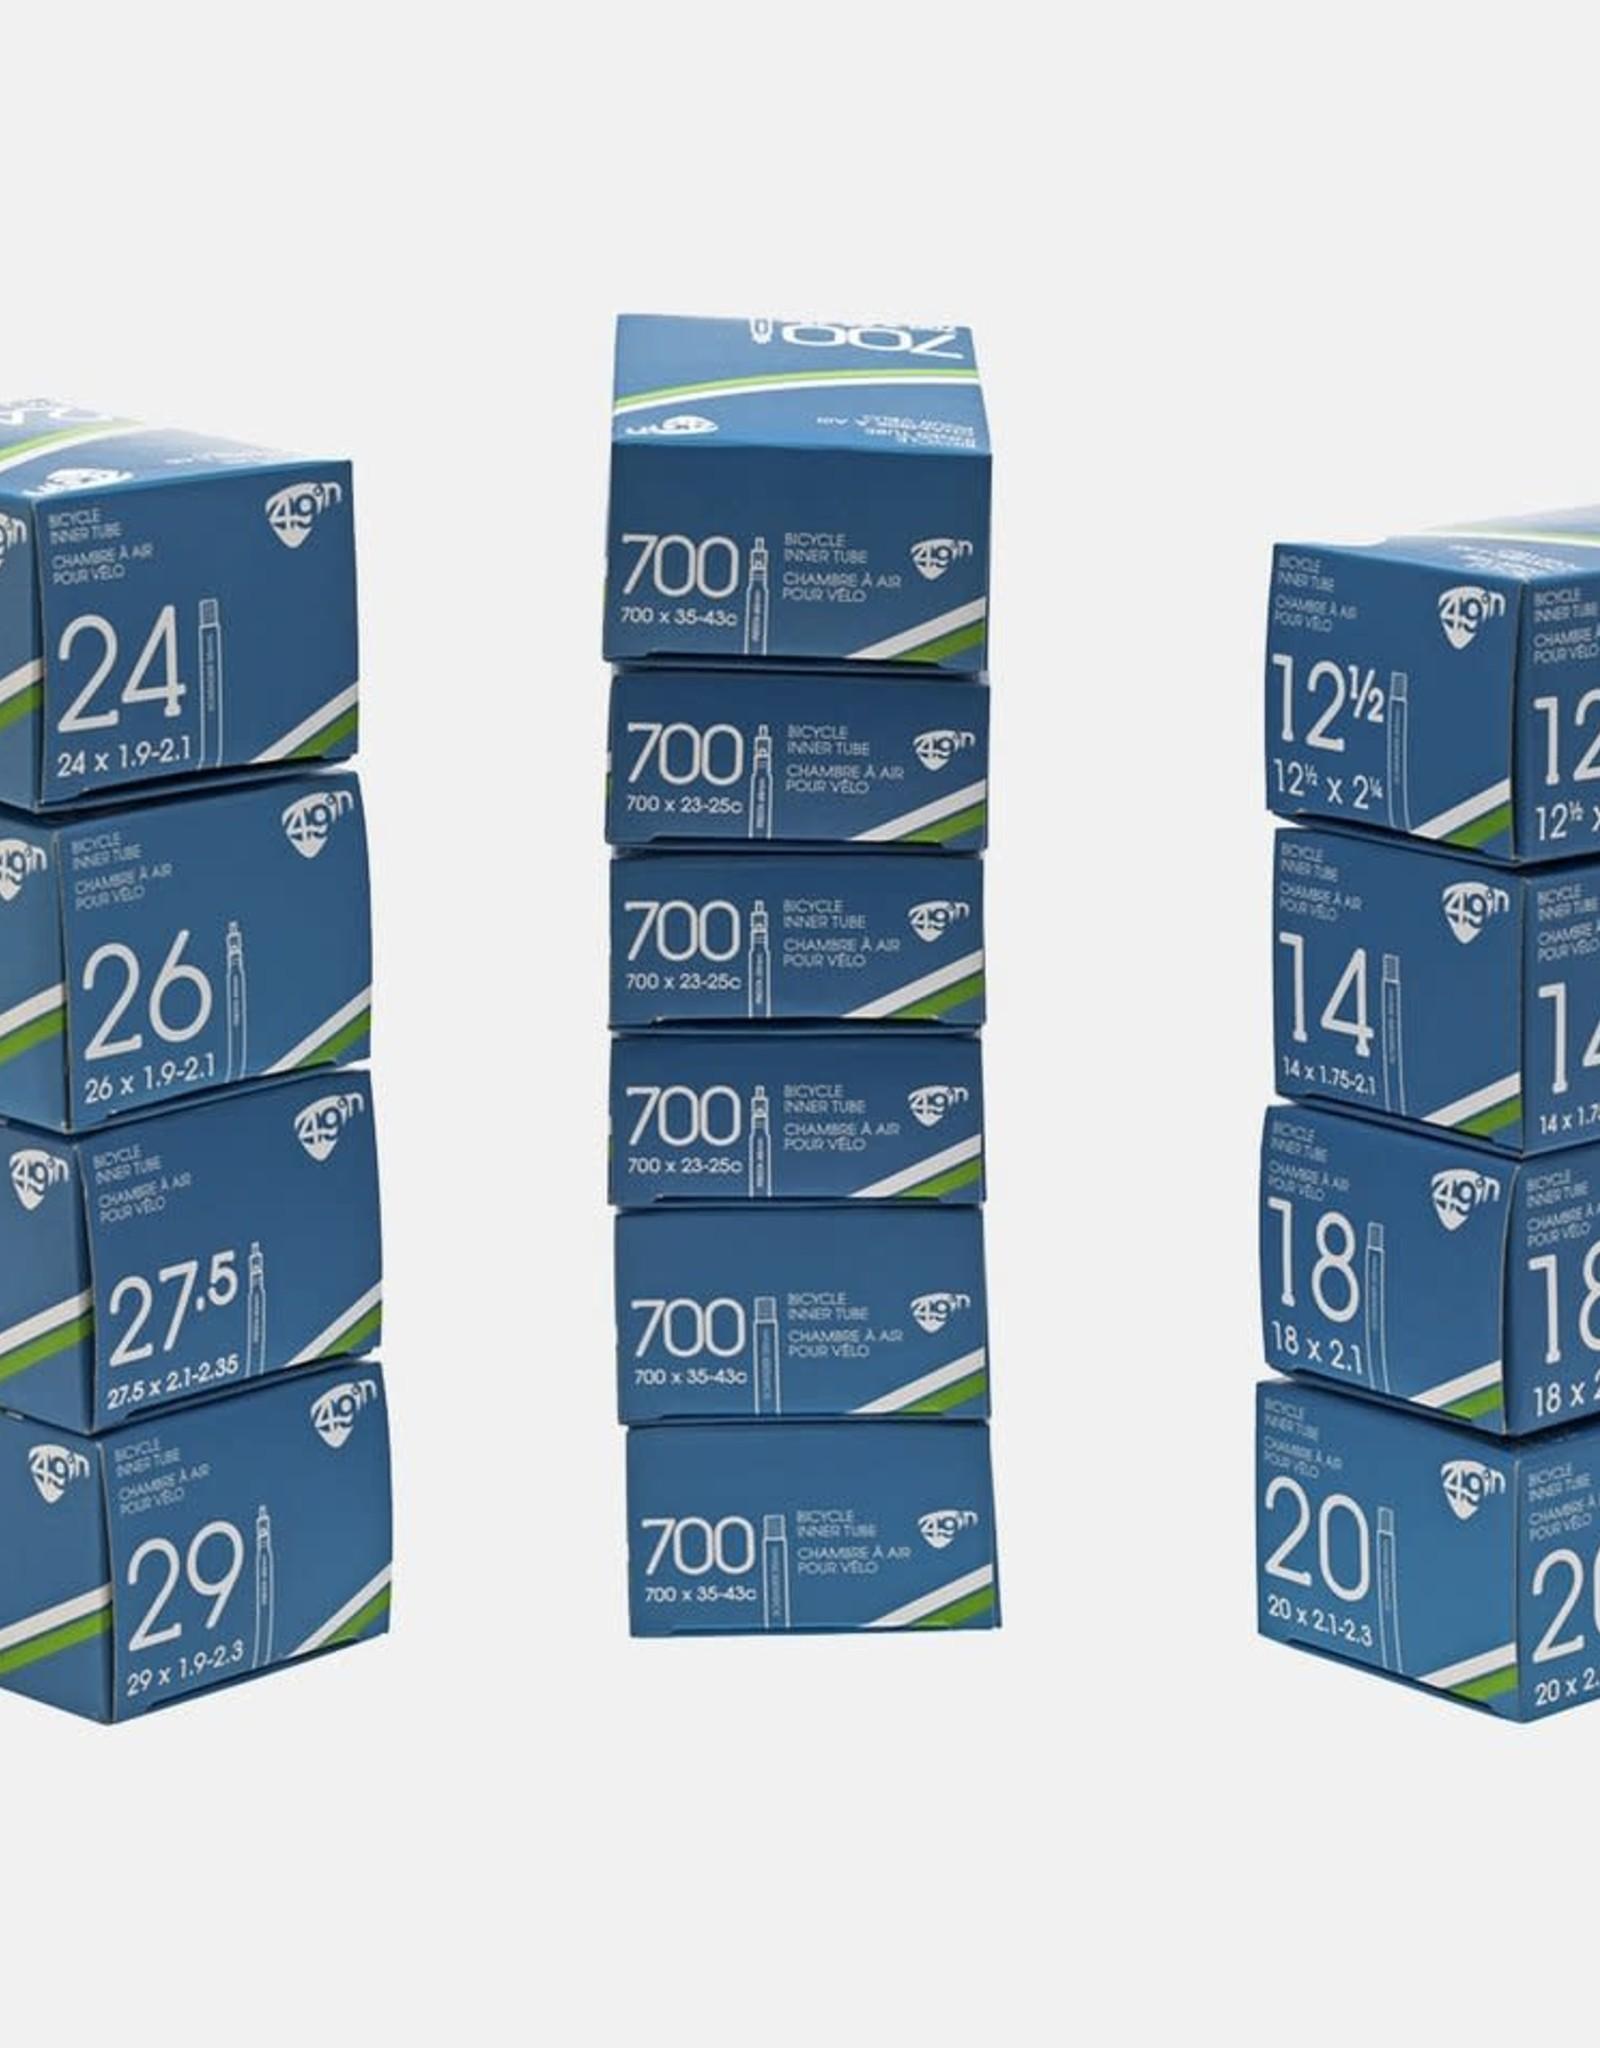 49N 49N STD 700C x 23-28MM P/V48